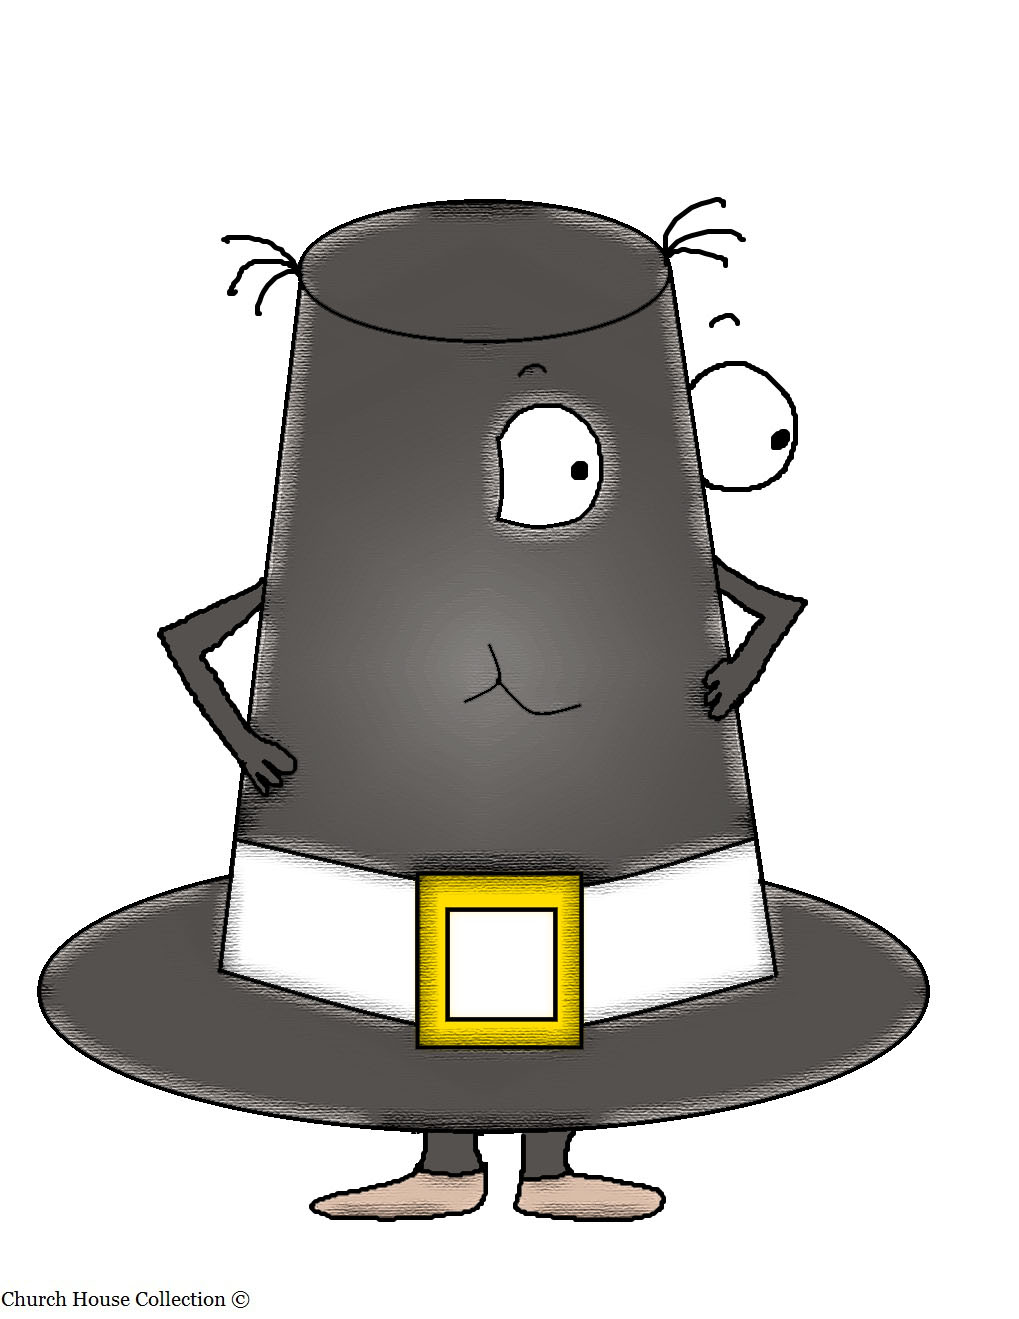 church house collection blog free printable pilgrim pilgrim bonnet clipart pilgrim hat clipart free